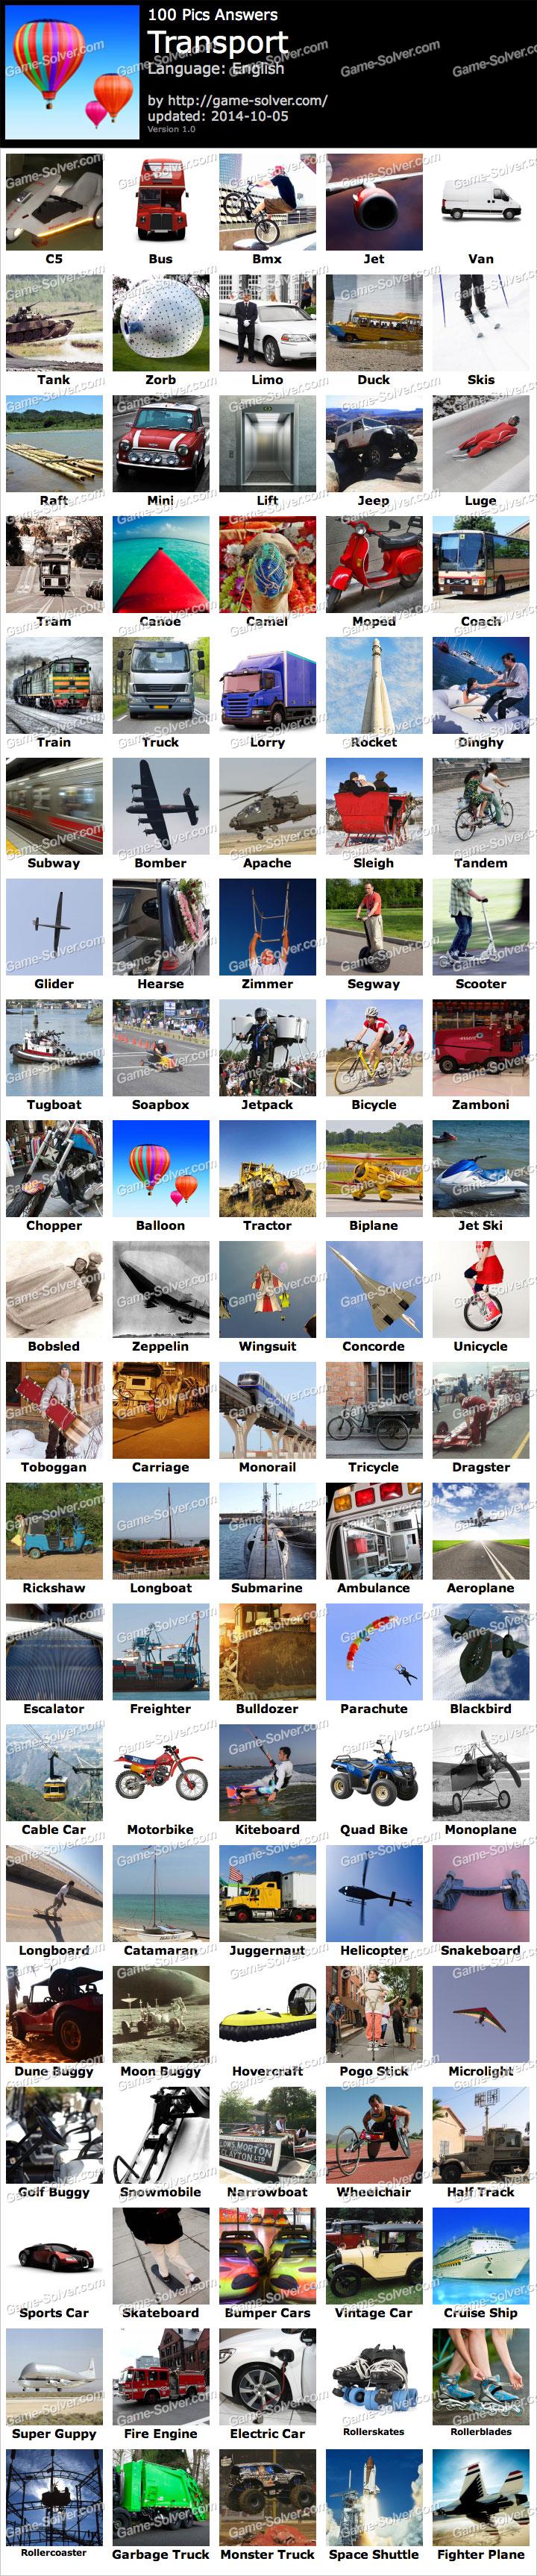 100 Pics Transport Game Solver